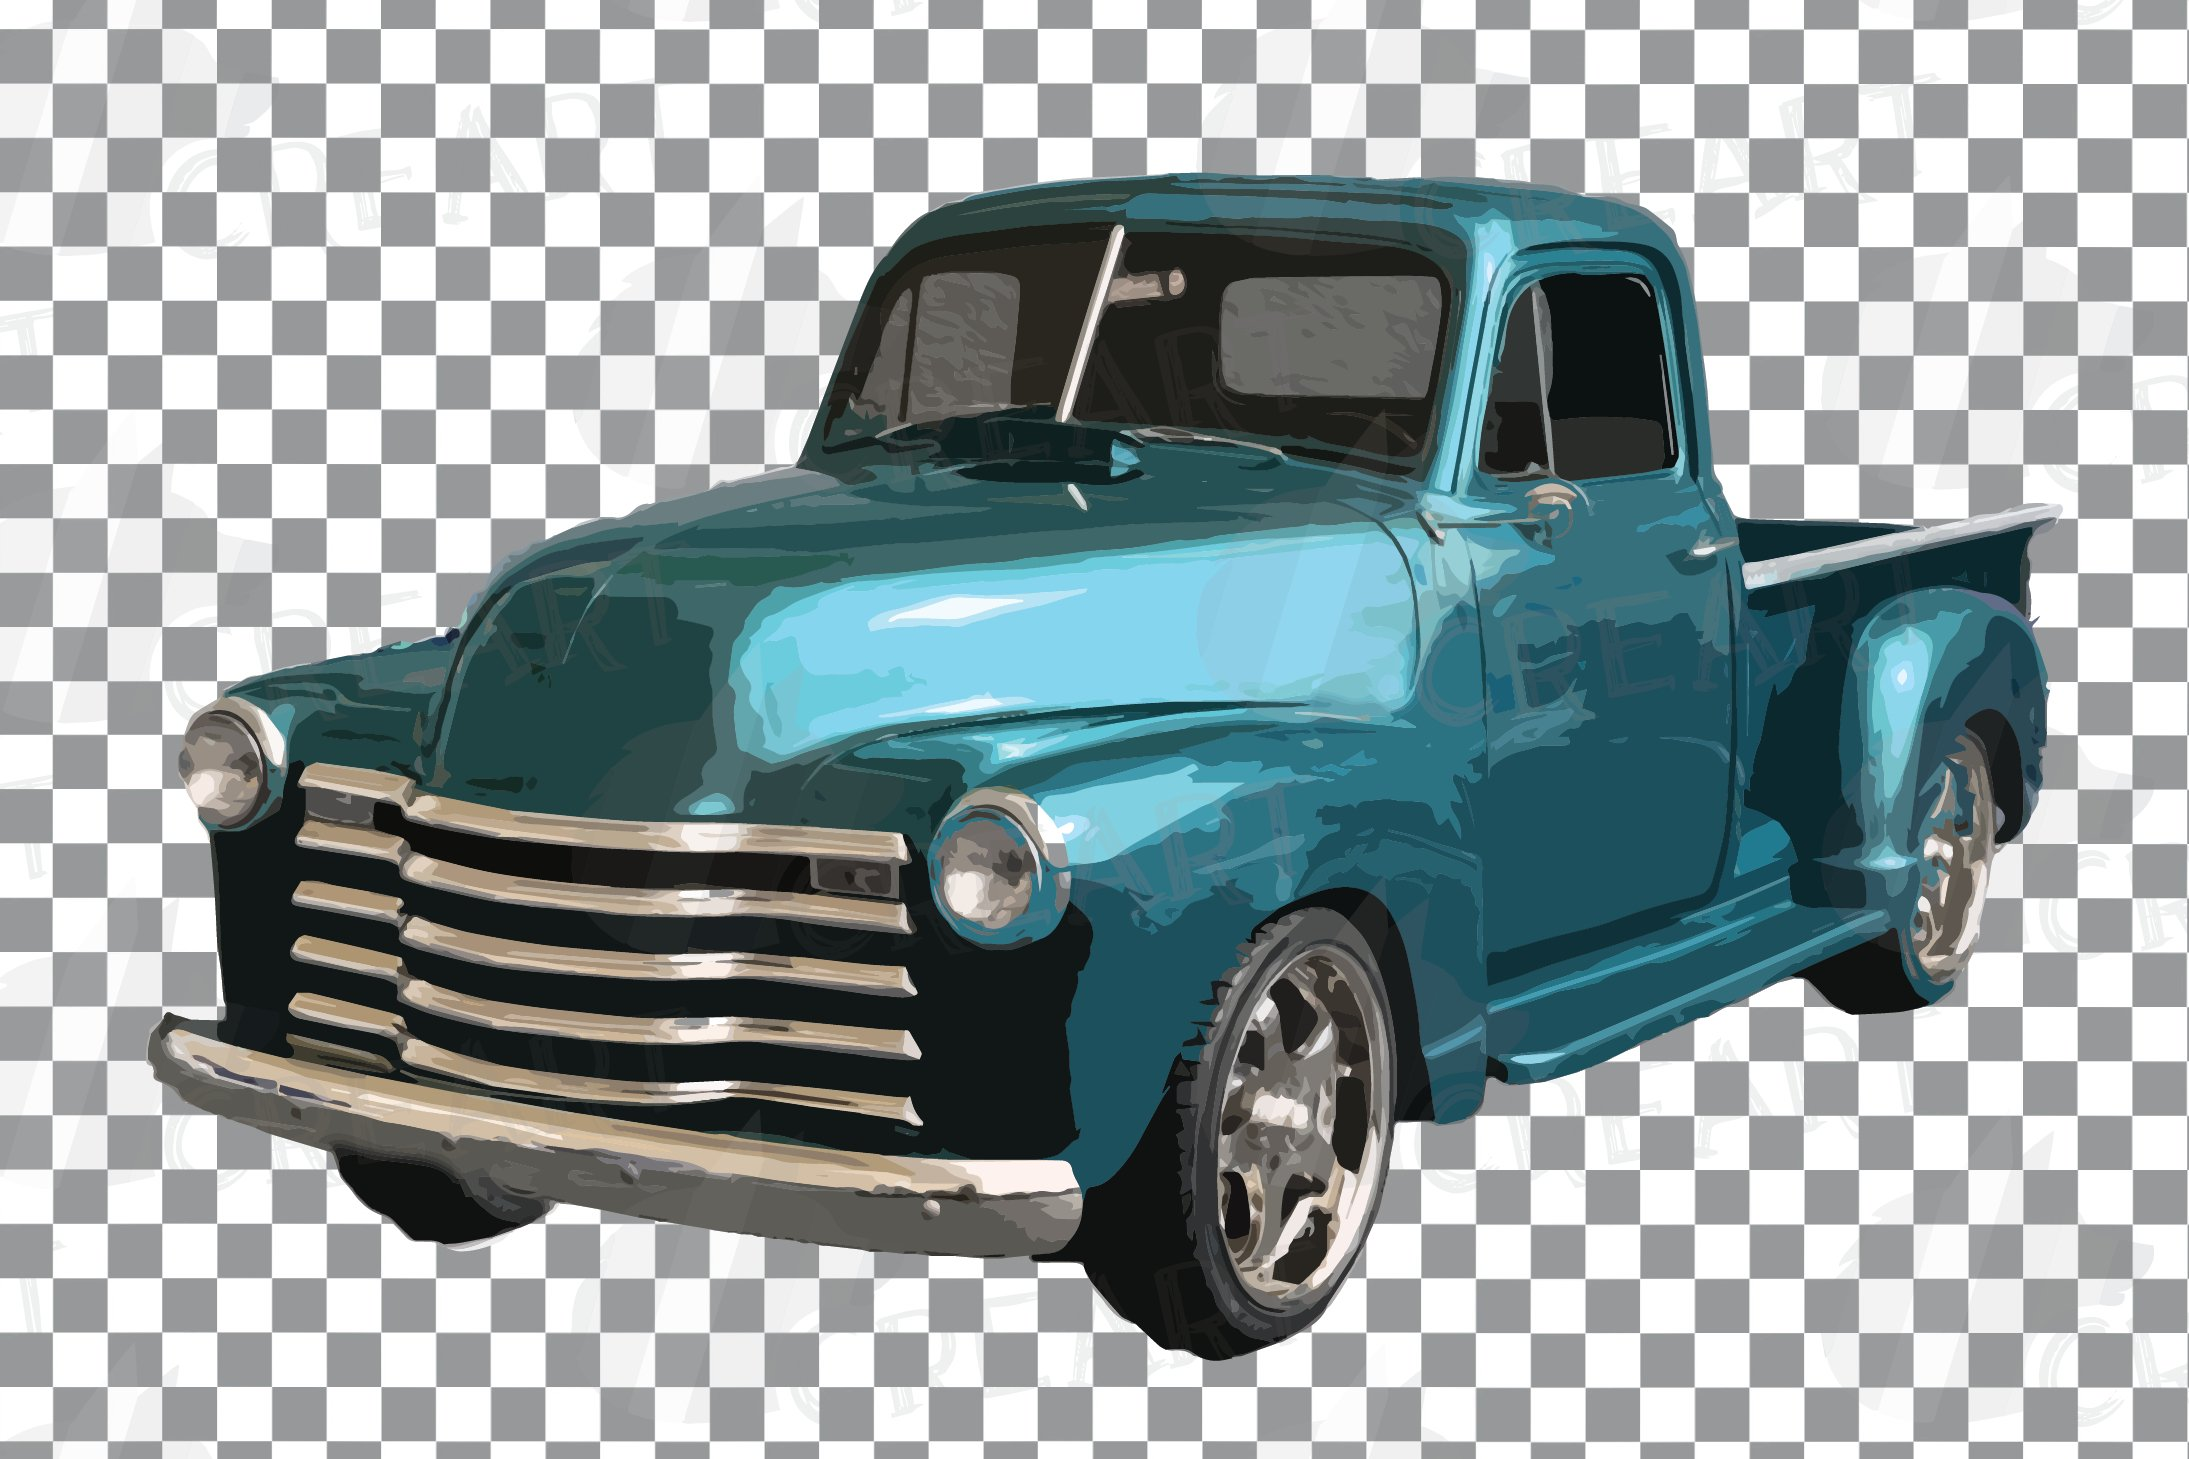 Download Vintage Cars Decor Clip Art Watercolor Classic Cars Nursery 369047 Illustrations Design Bundles